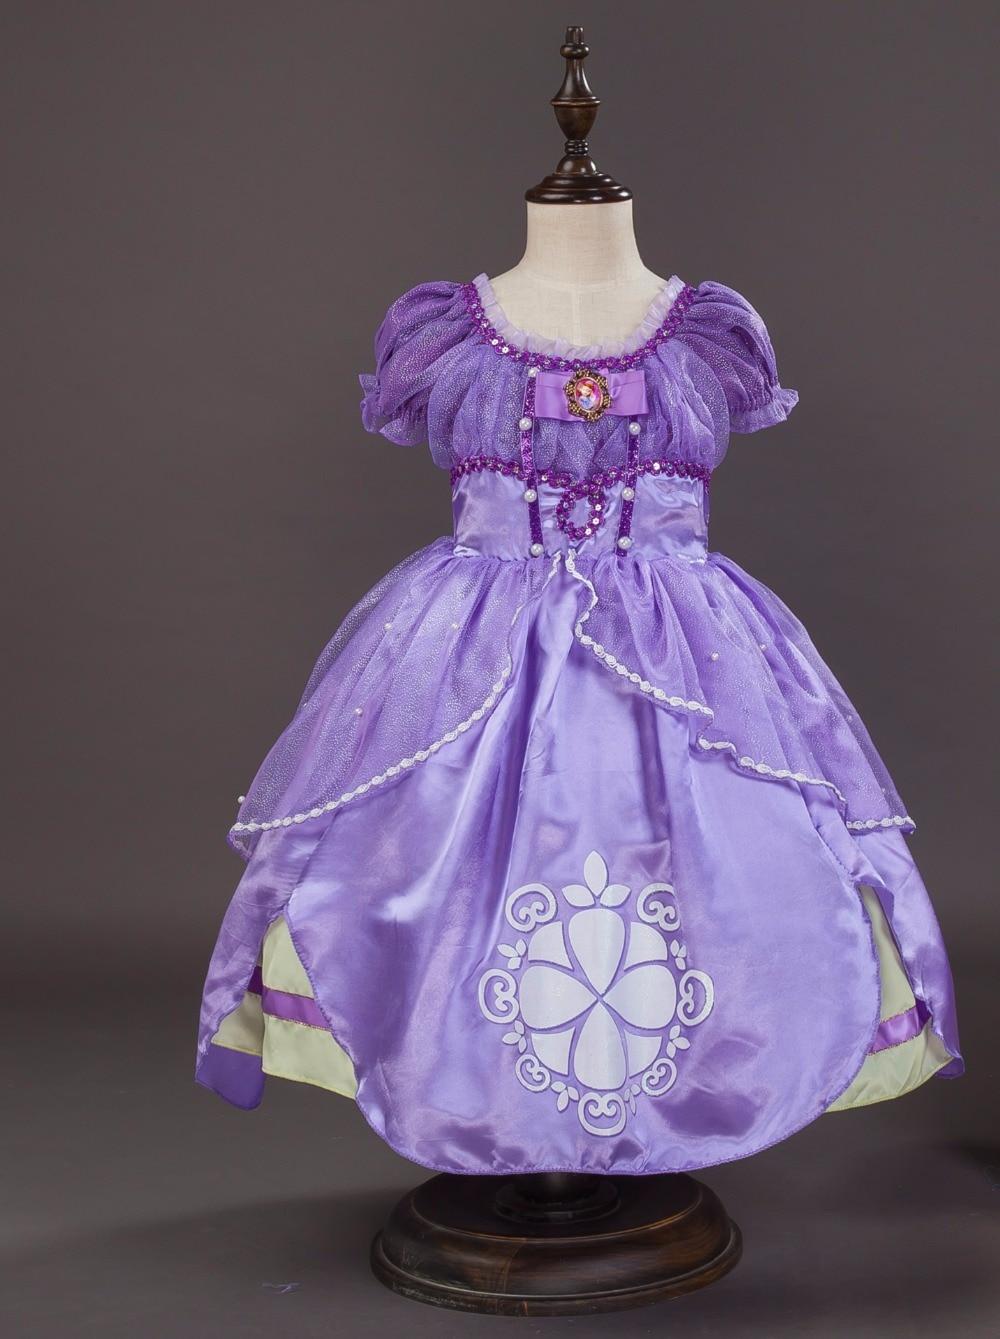 2017 Fancy Kids Girls High Quality Sofia Princess Fluffy Costume Princess Sophia Dress Summer Dress Birthday Party dress